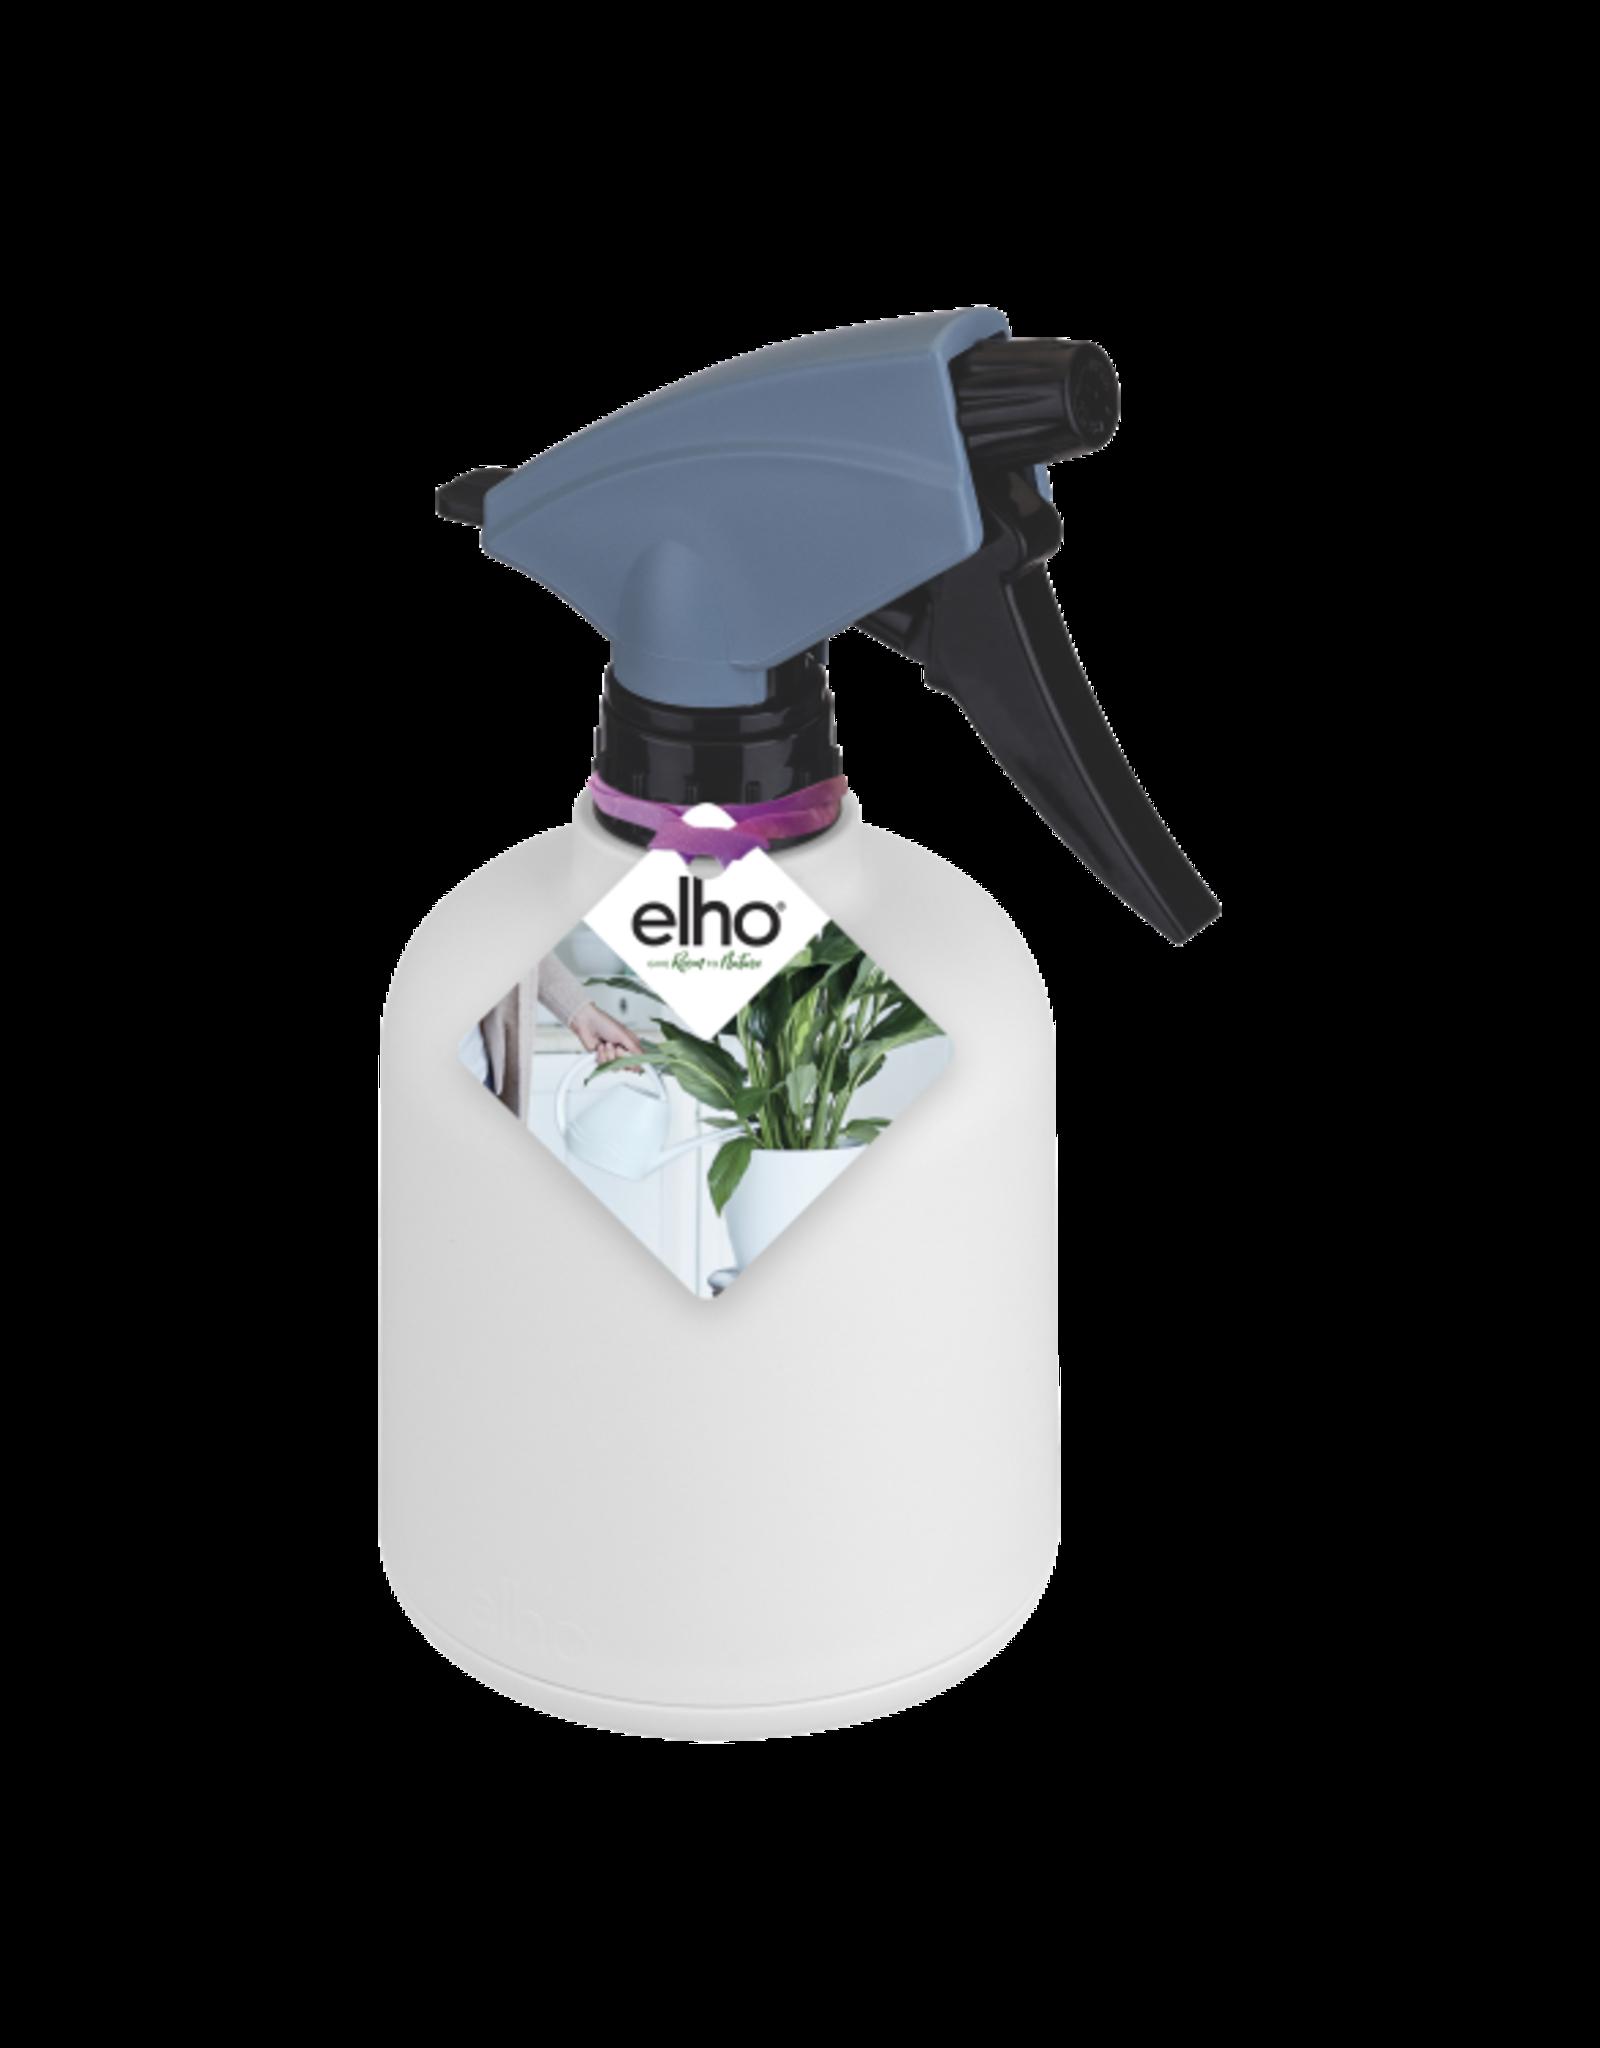 Elho b.for soft sprayer - white